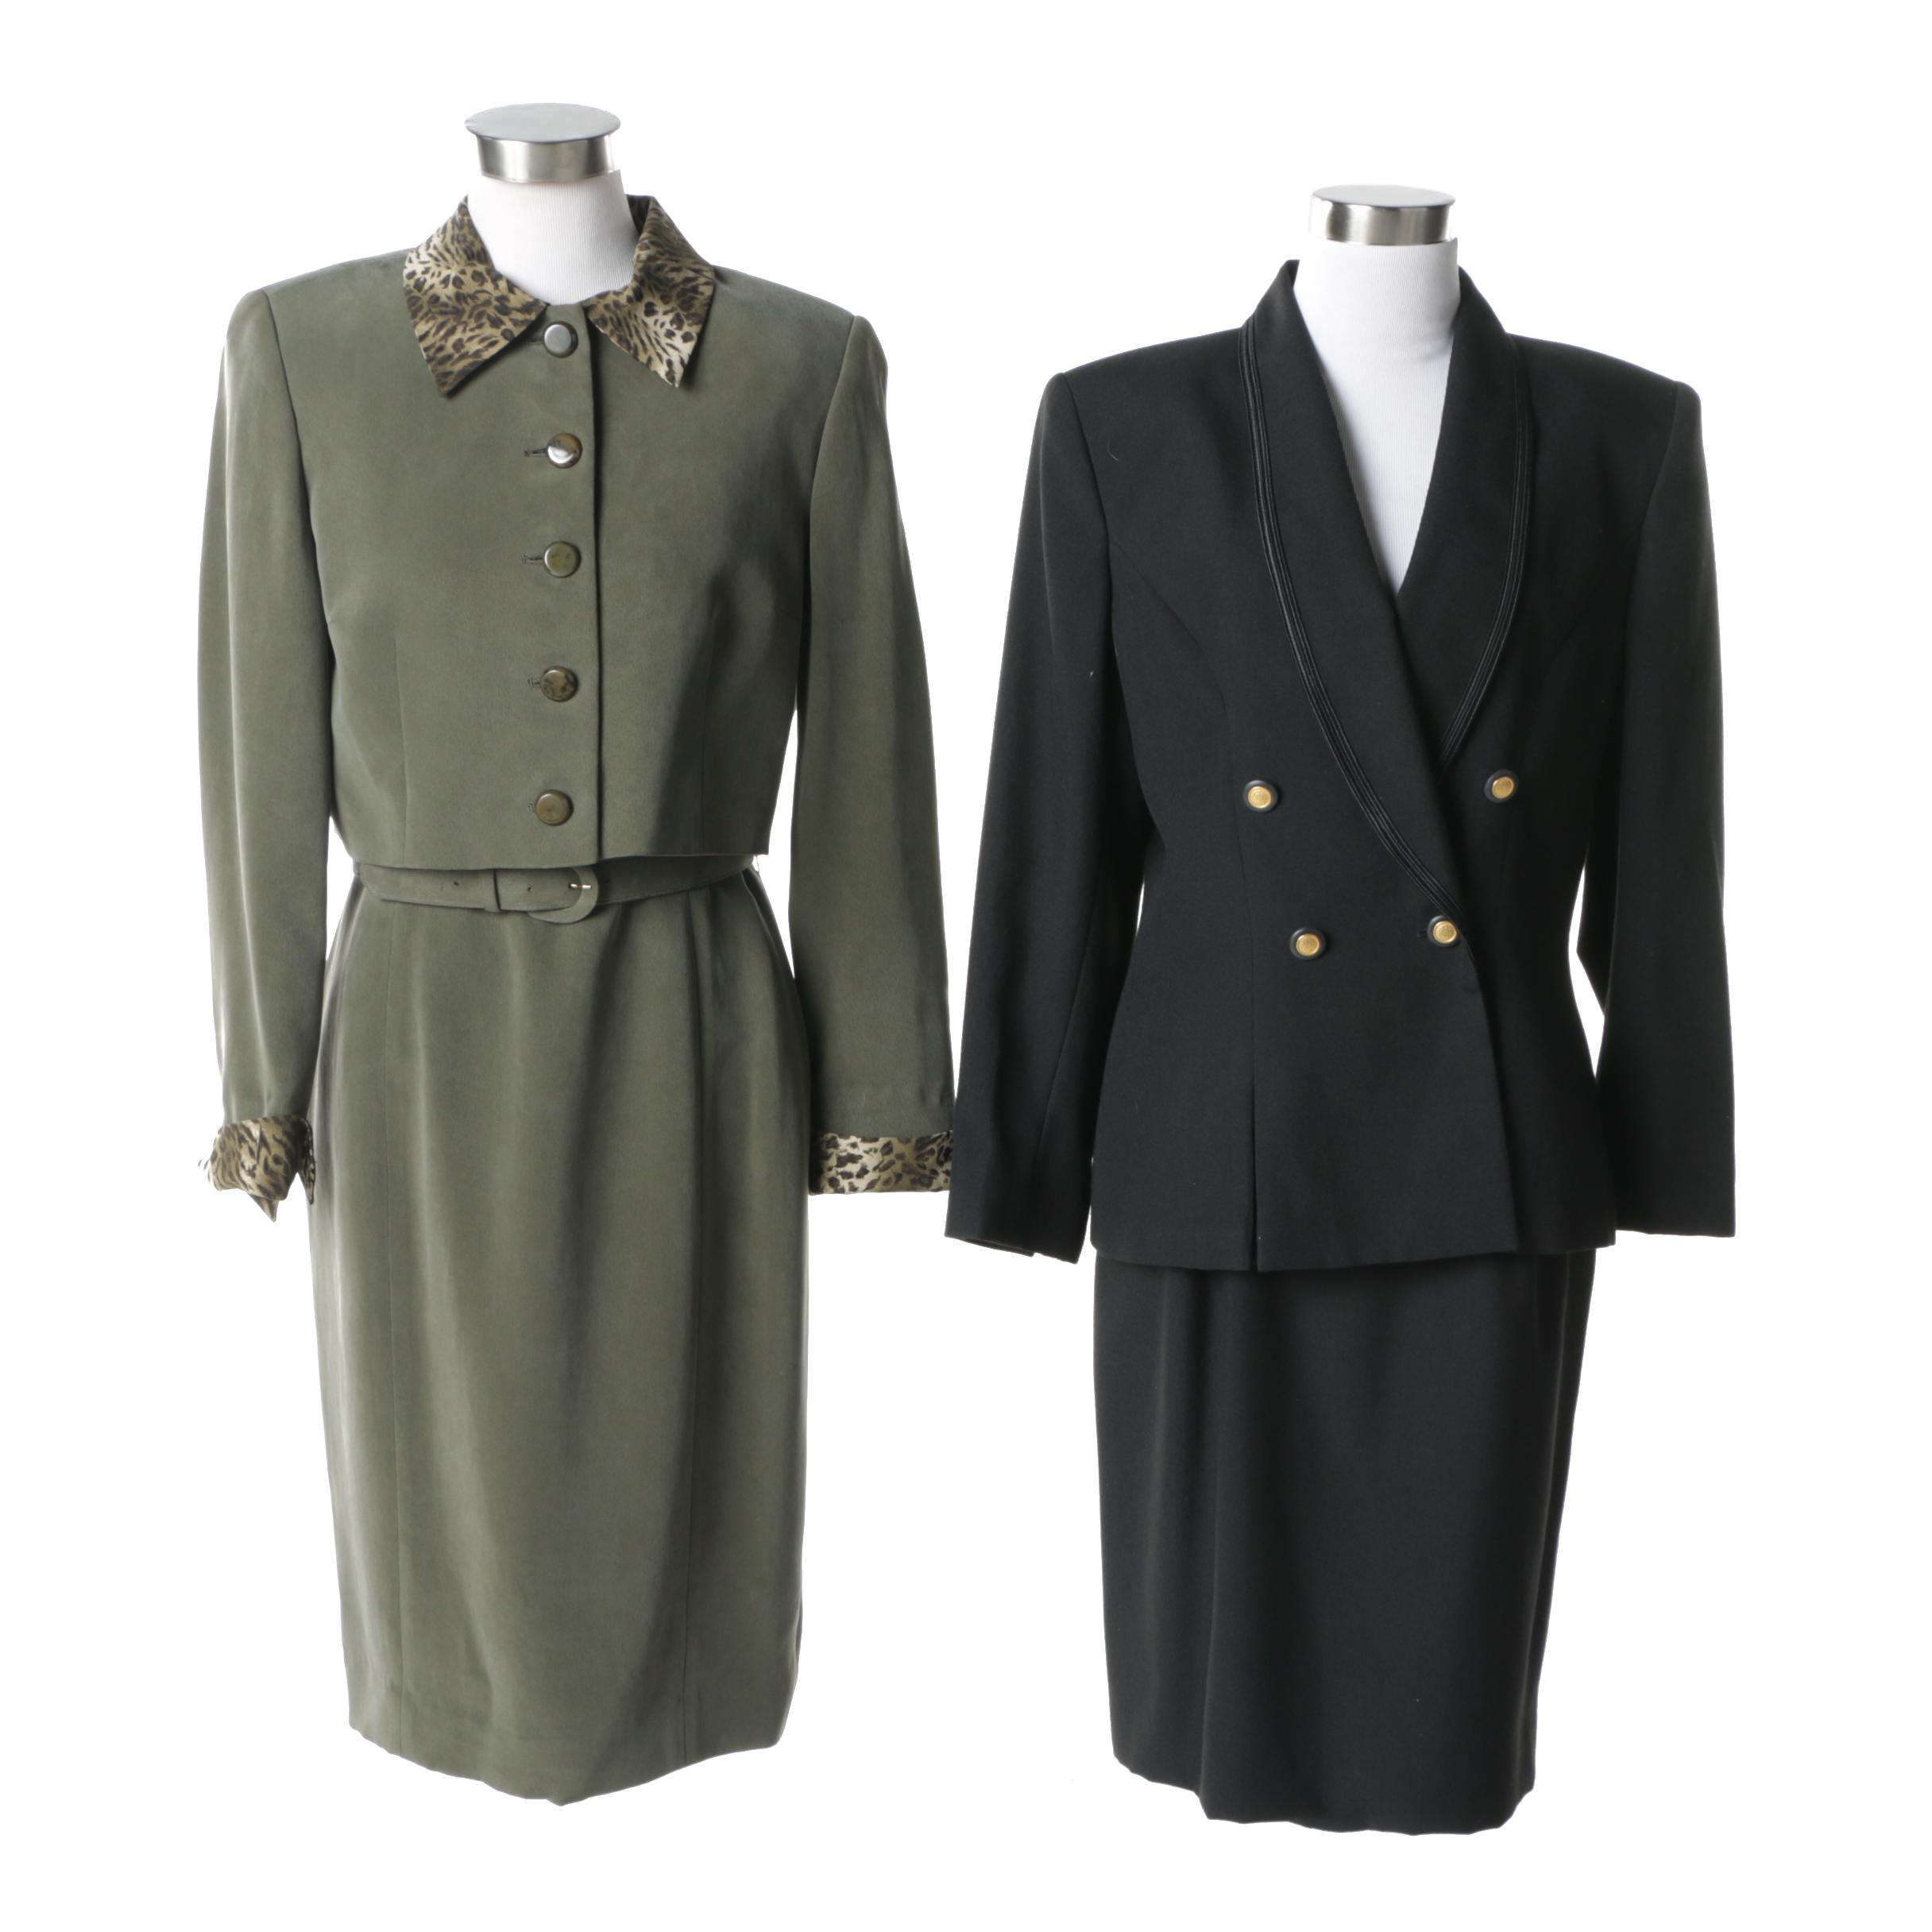 Women's Suits Including Dana Buchman